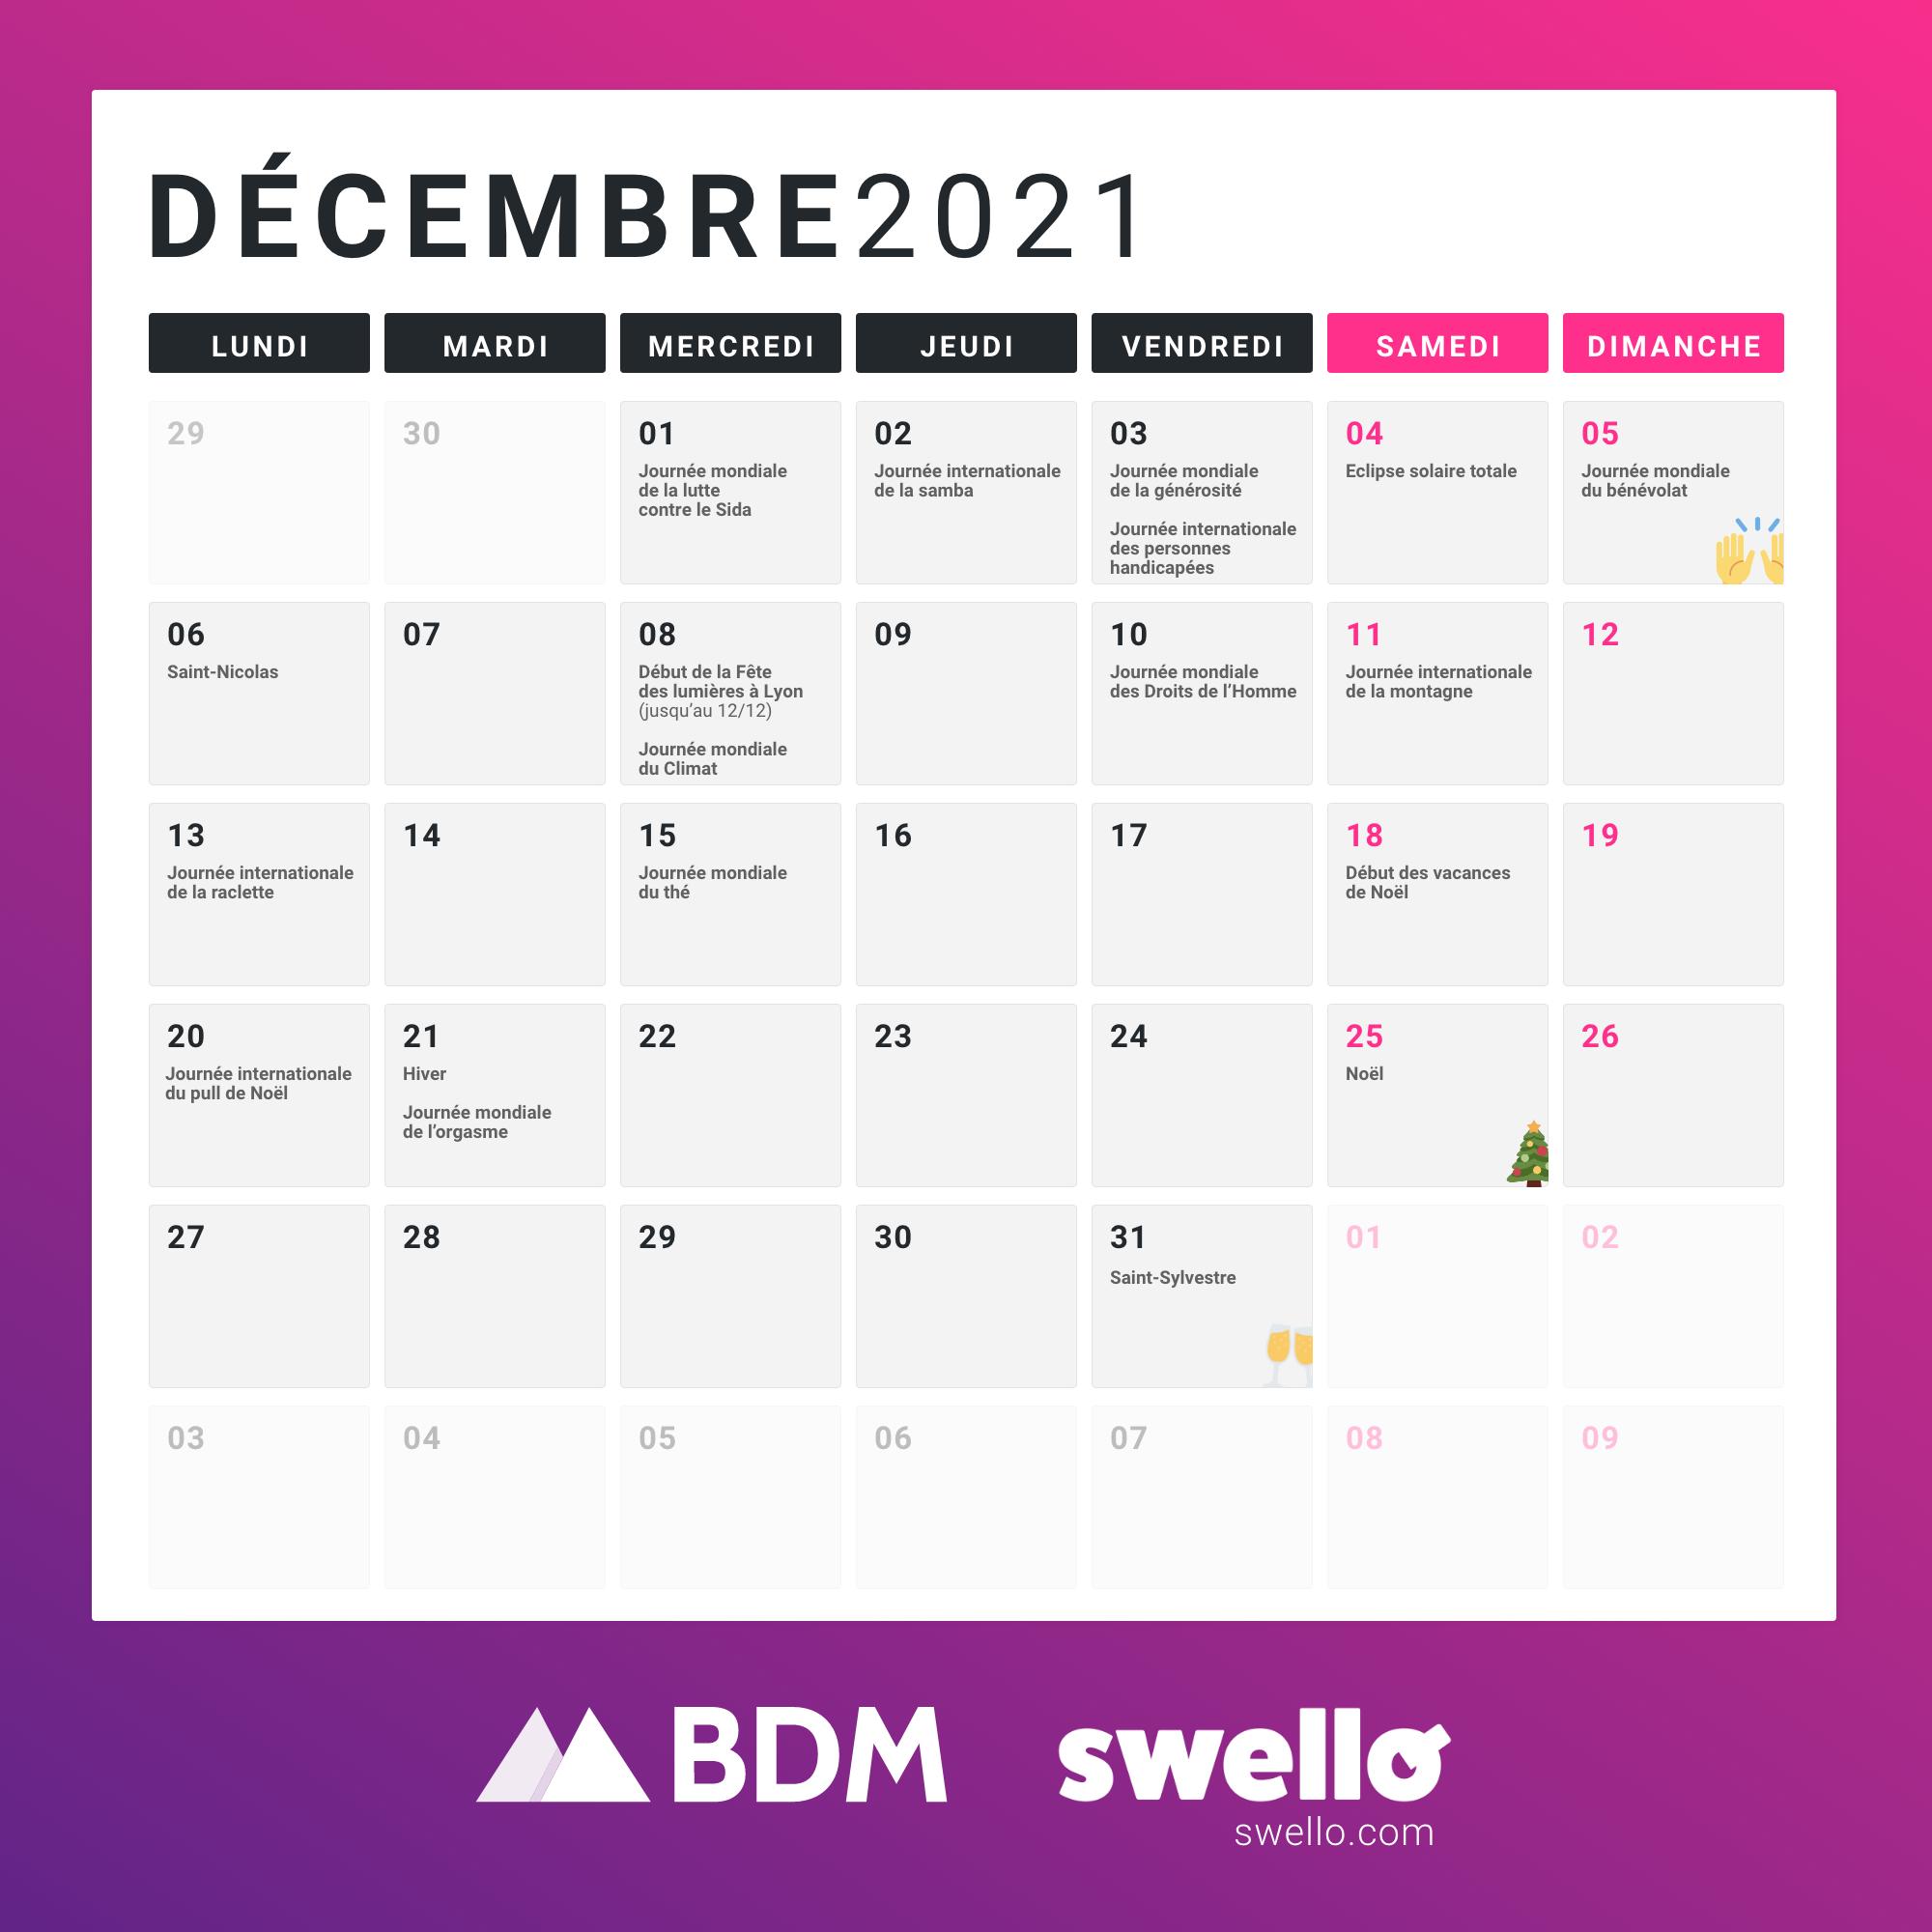 Calendrier Social Media 2021 Décembre